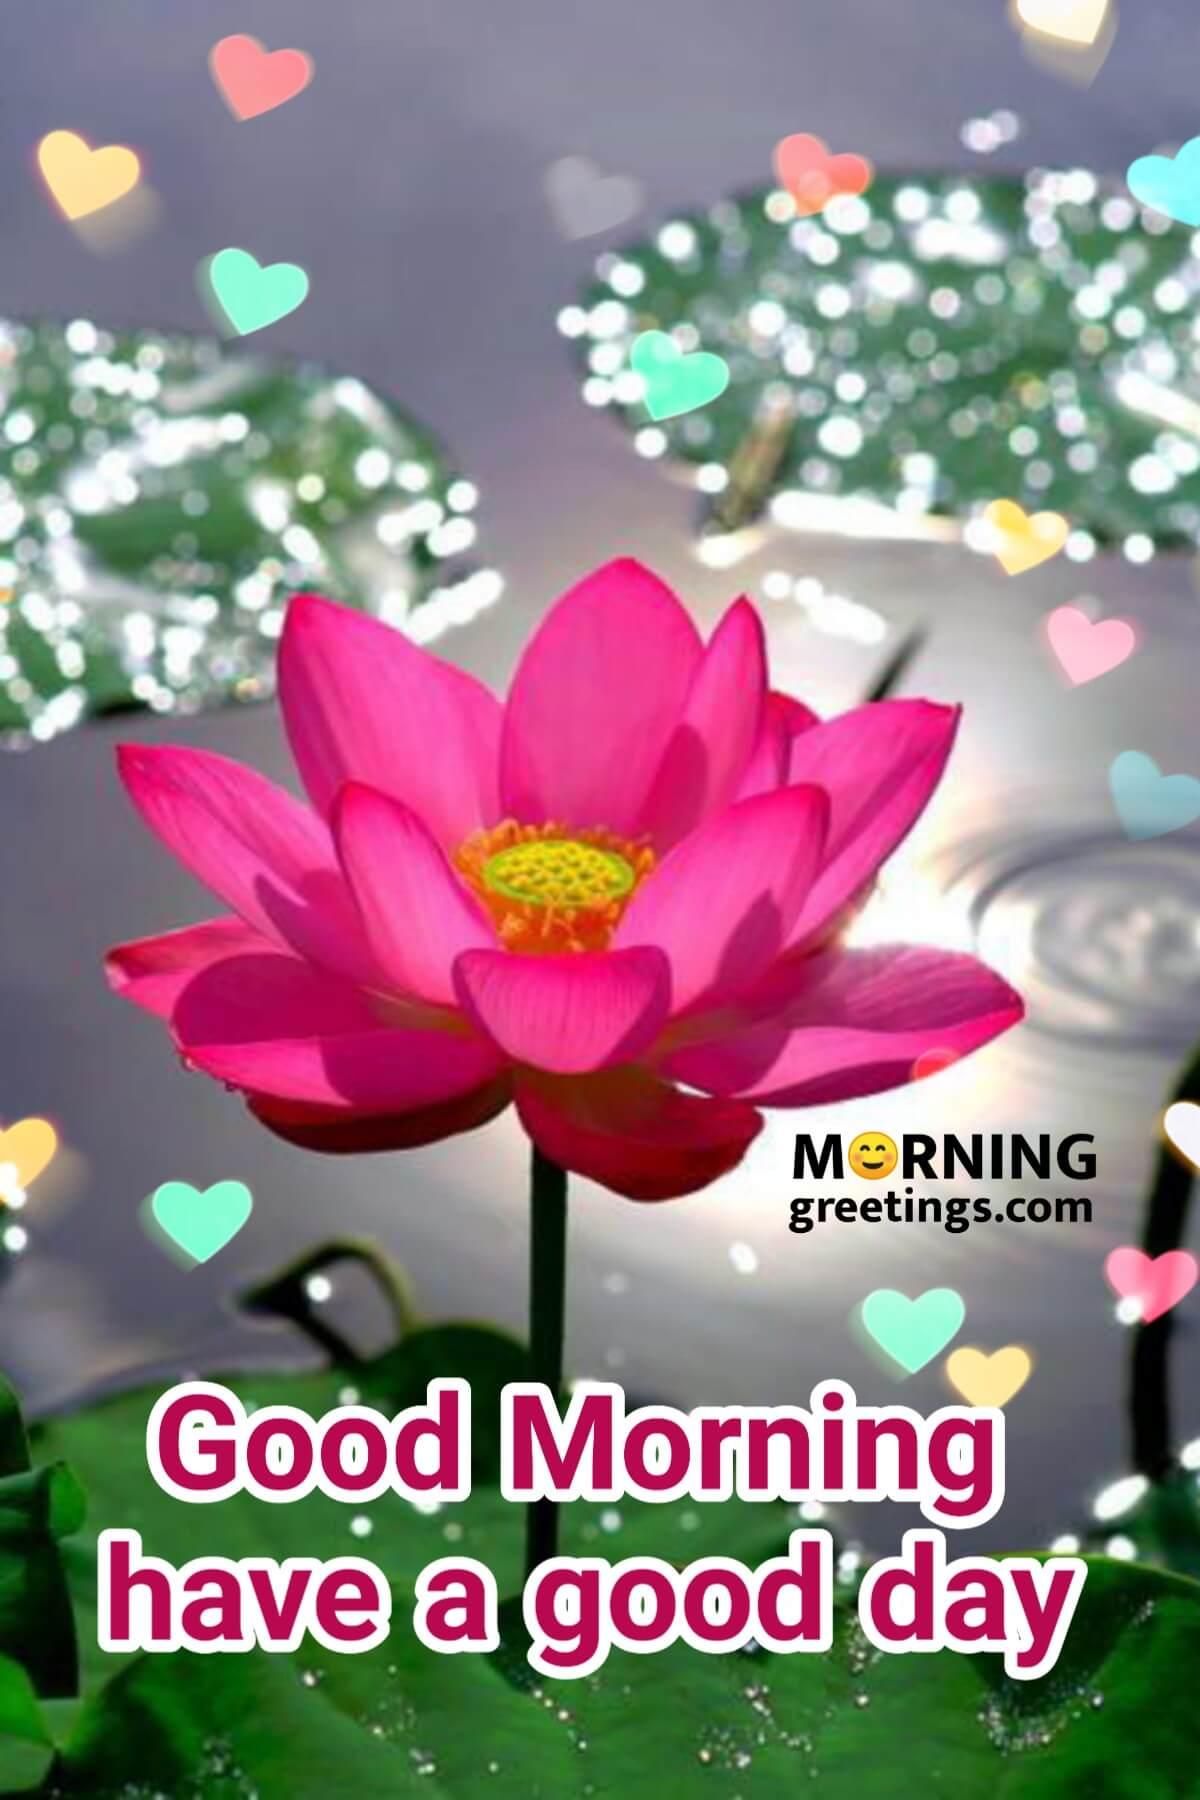 10 Most Beautiful Morning With Lotus - Morning Greetings – Morning